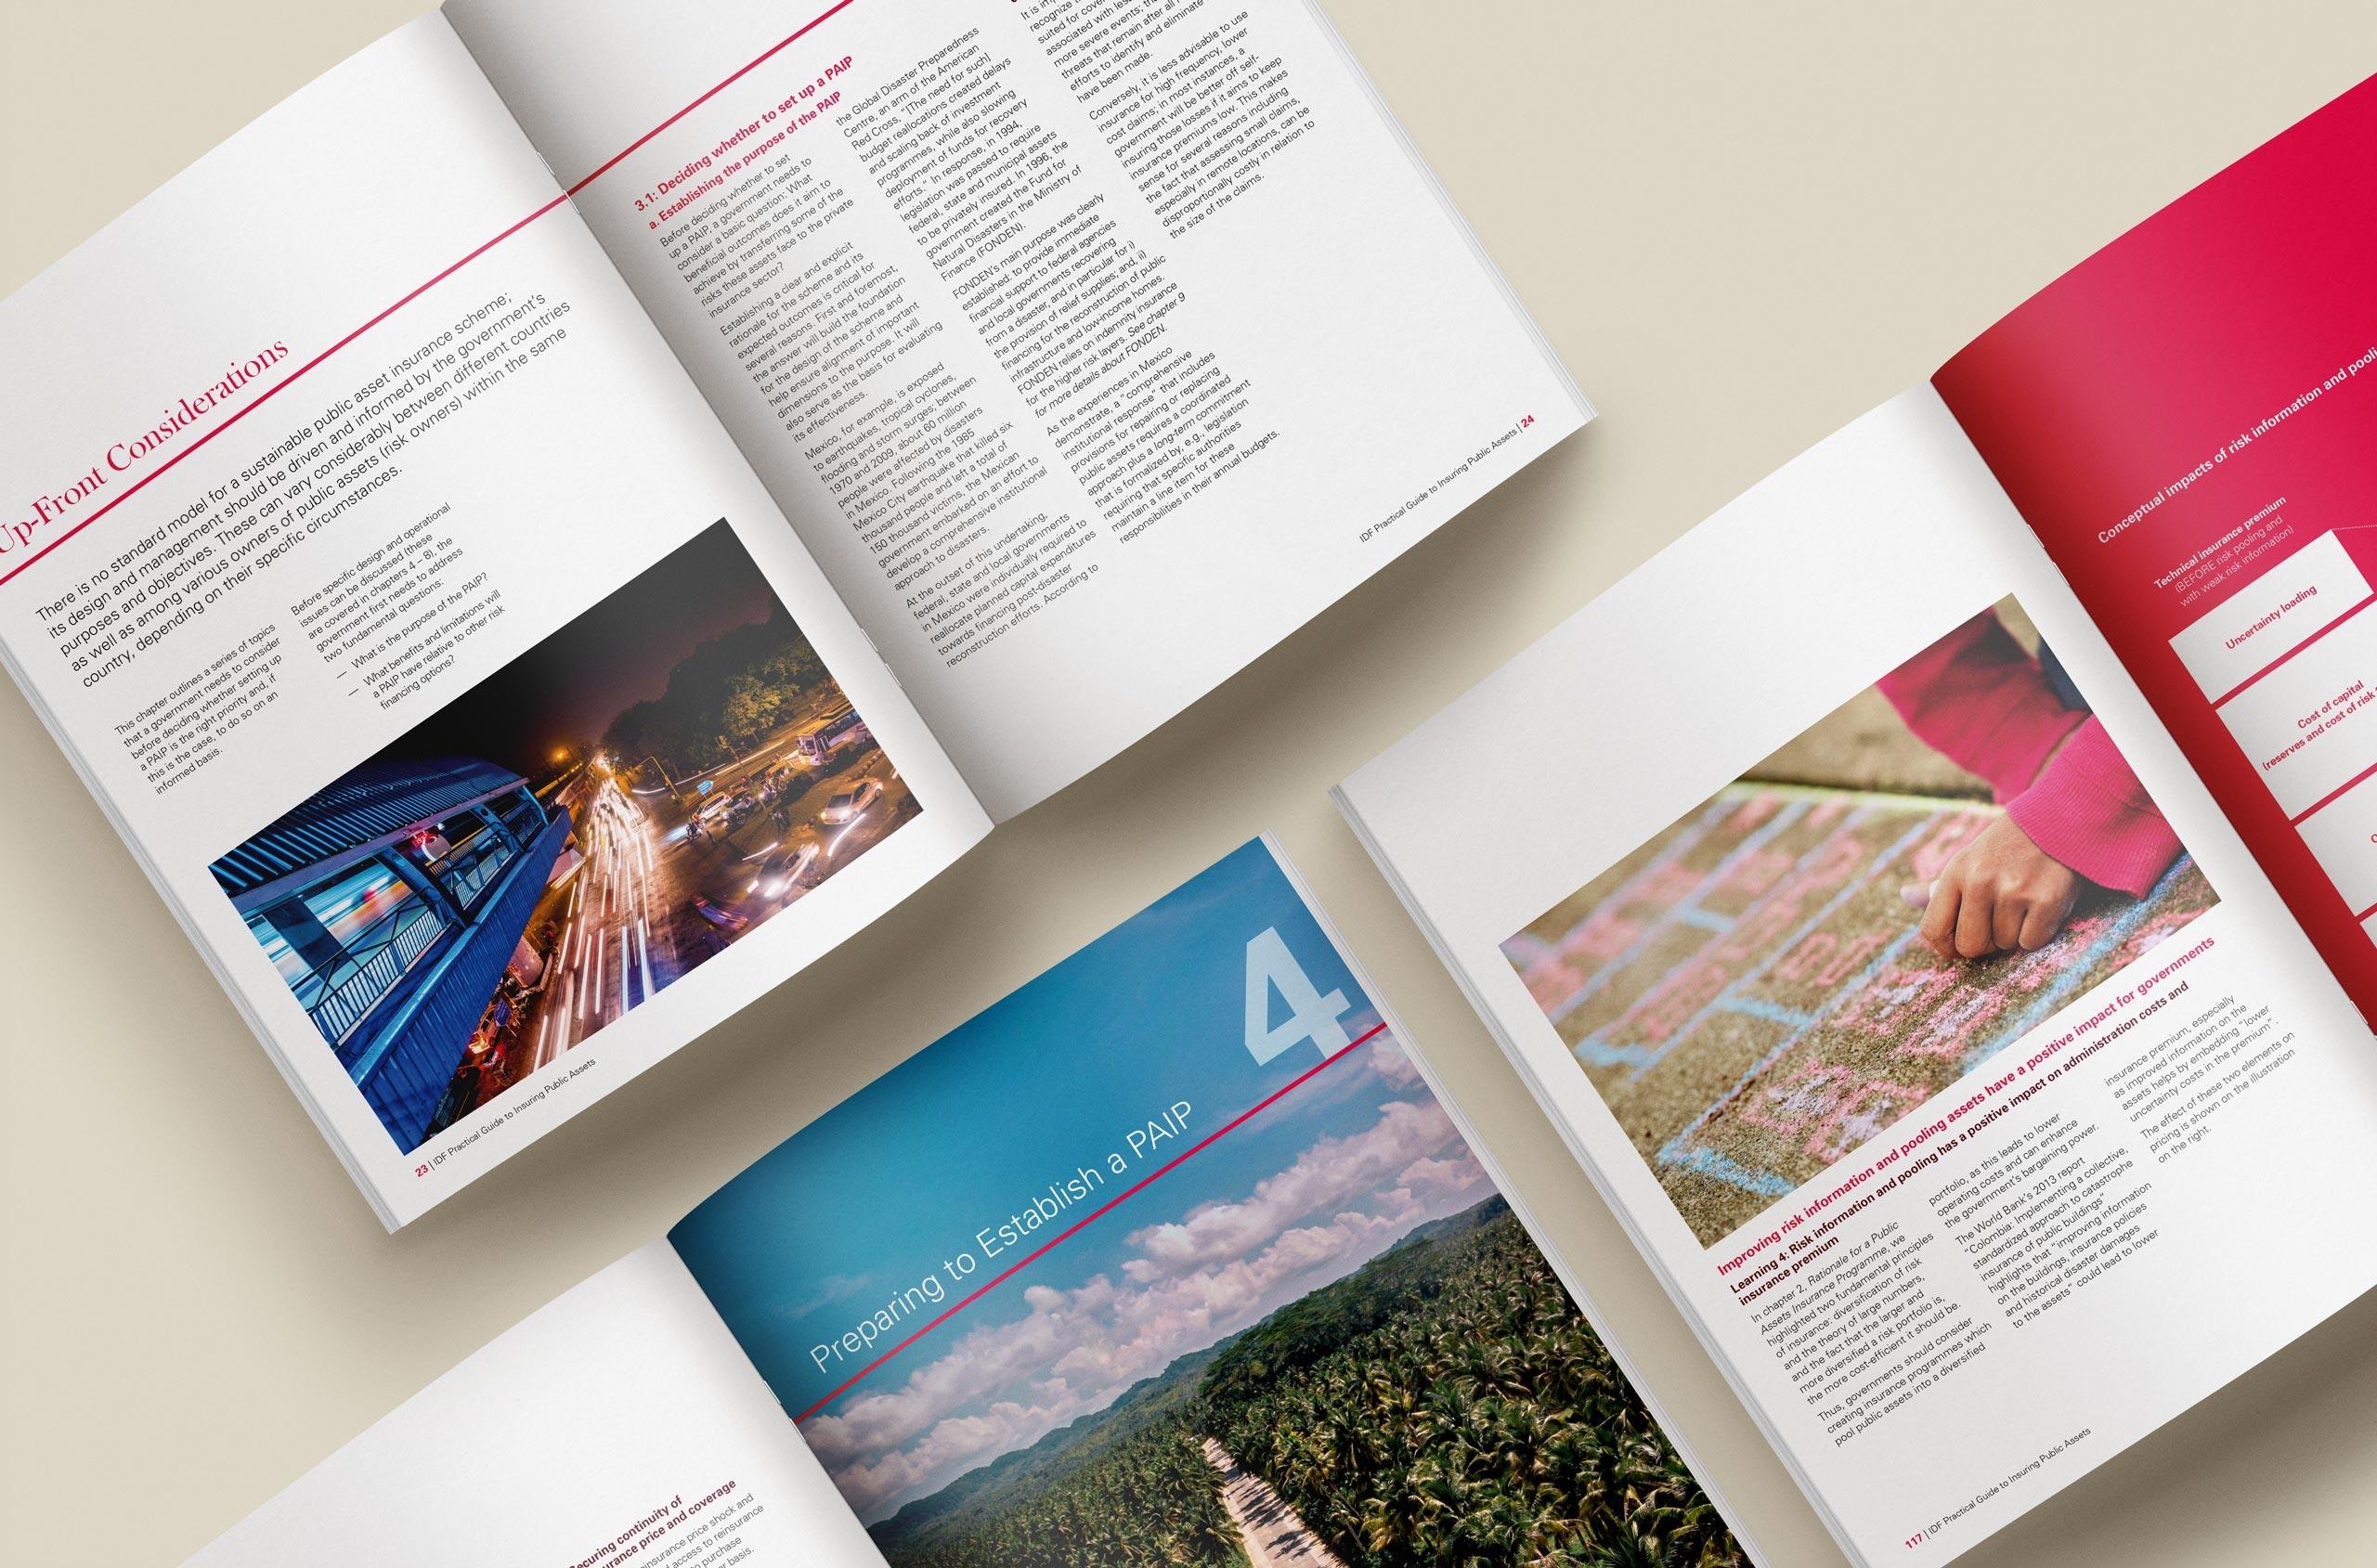 Glendale Creative IDF Brochure Spreads